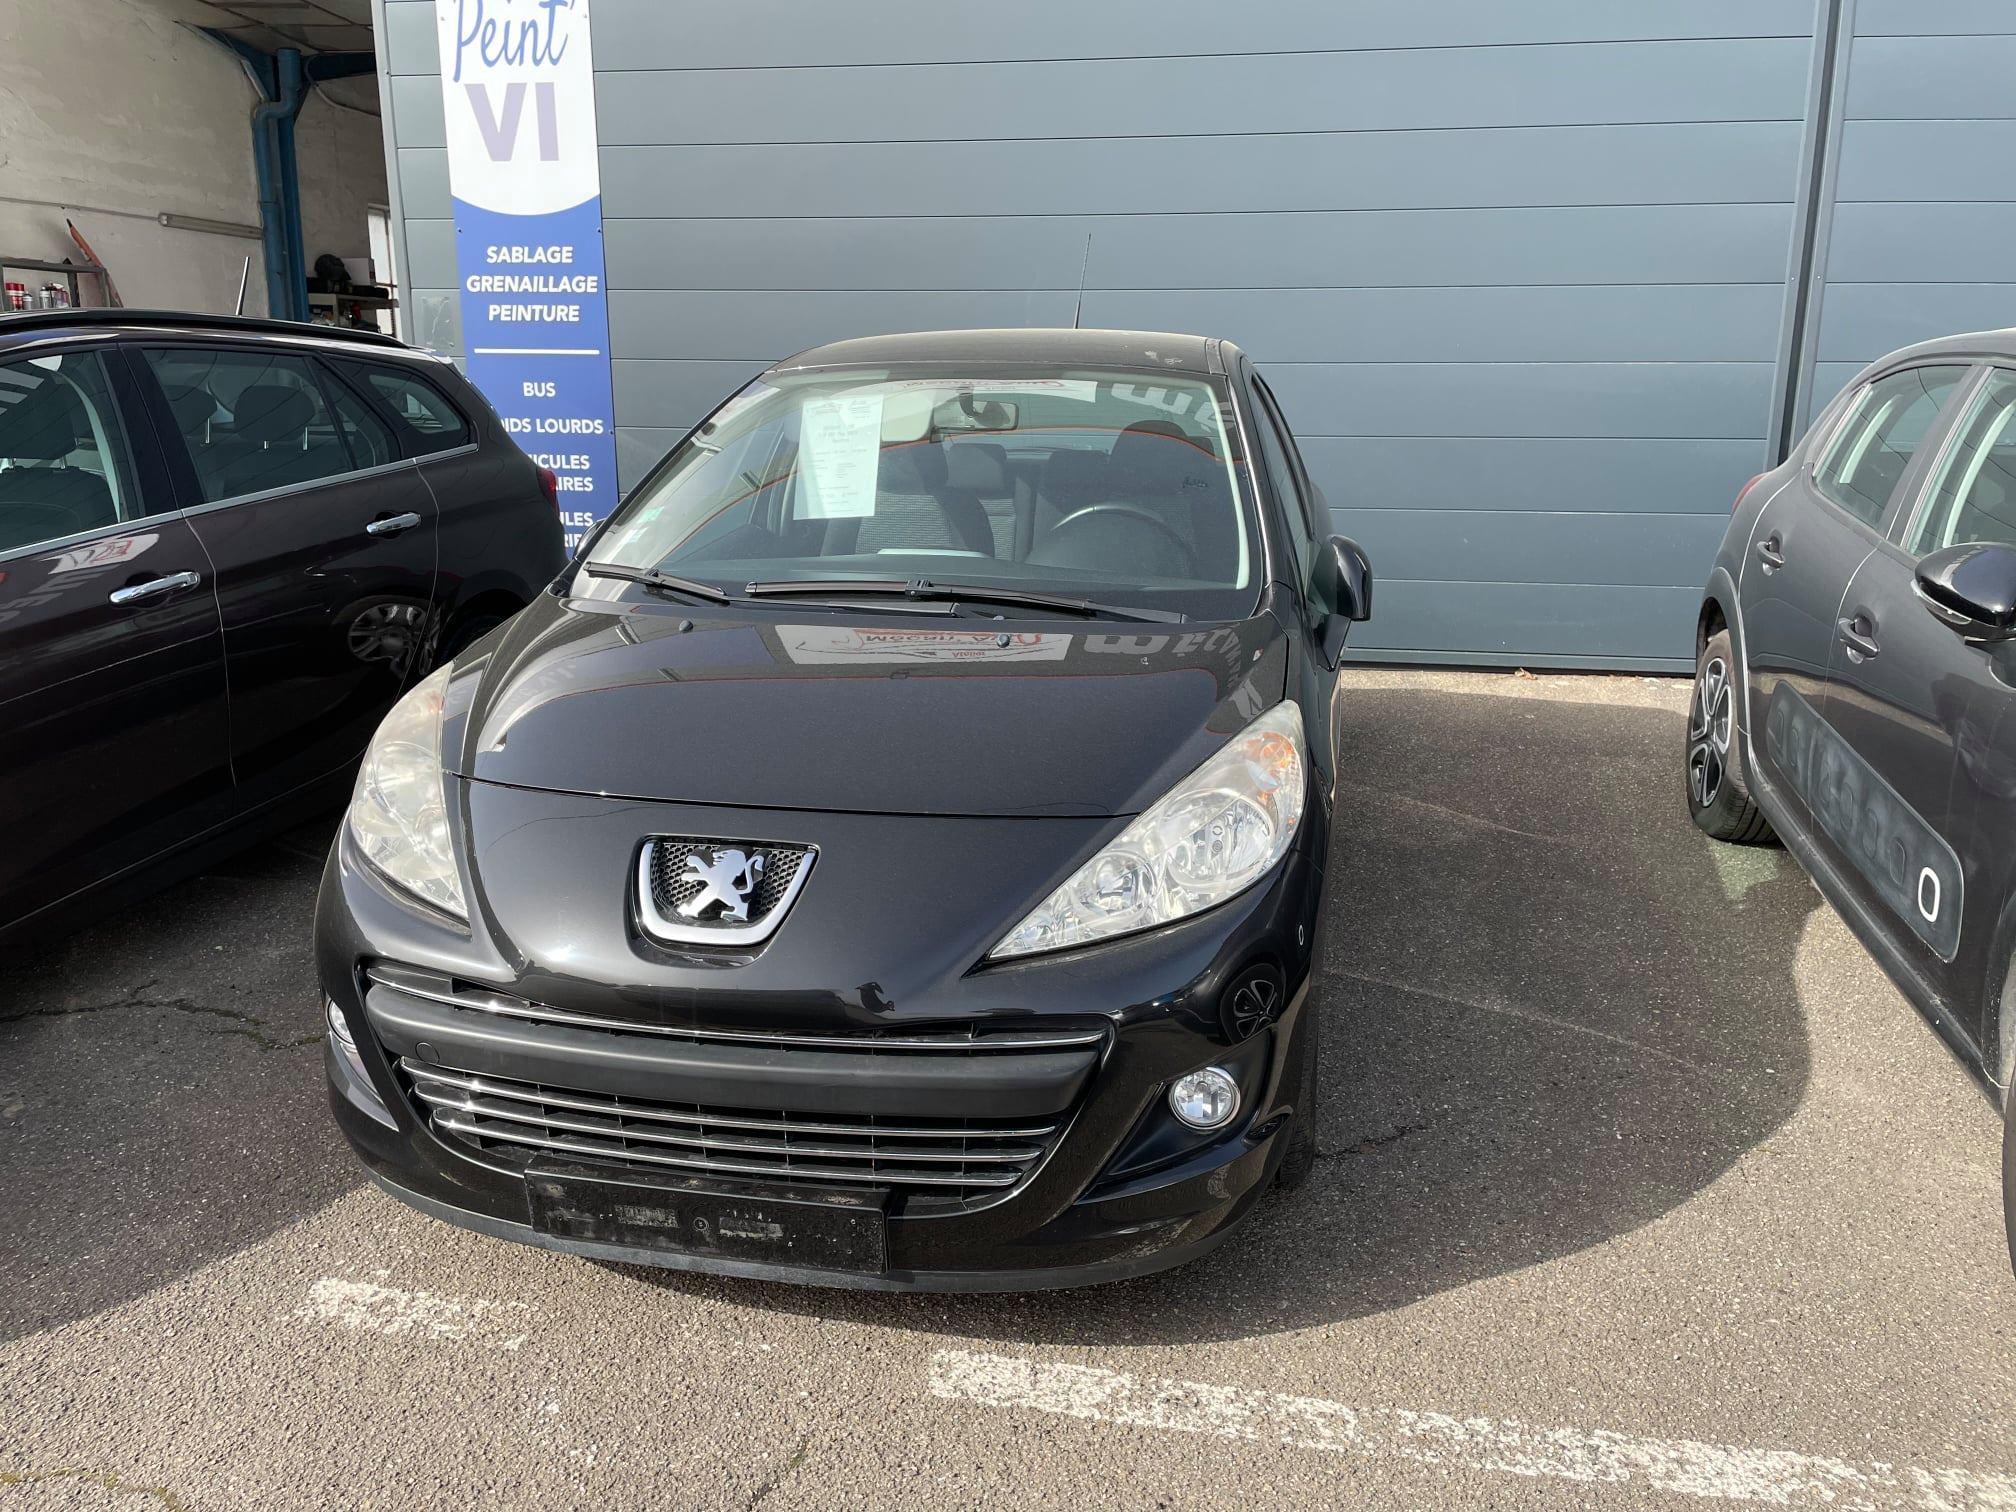 Peugeot 207 1.6 HDI Fap 90cv 5p